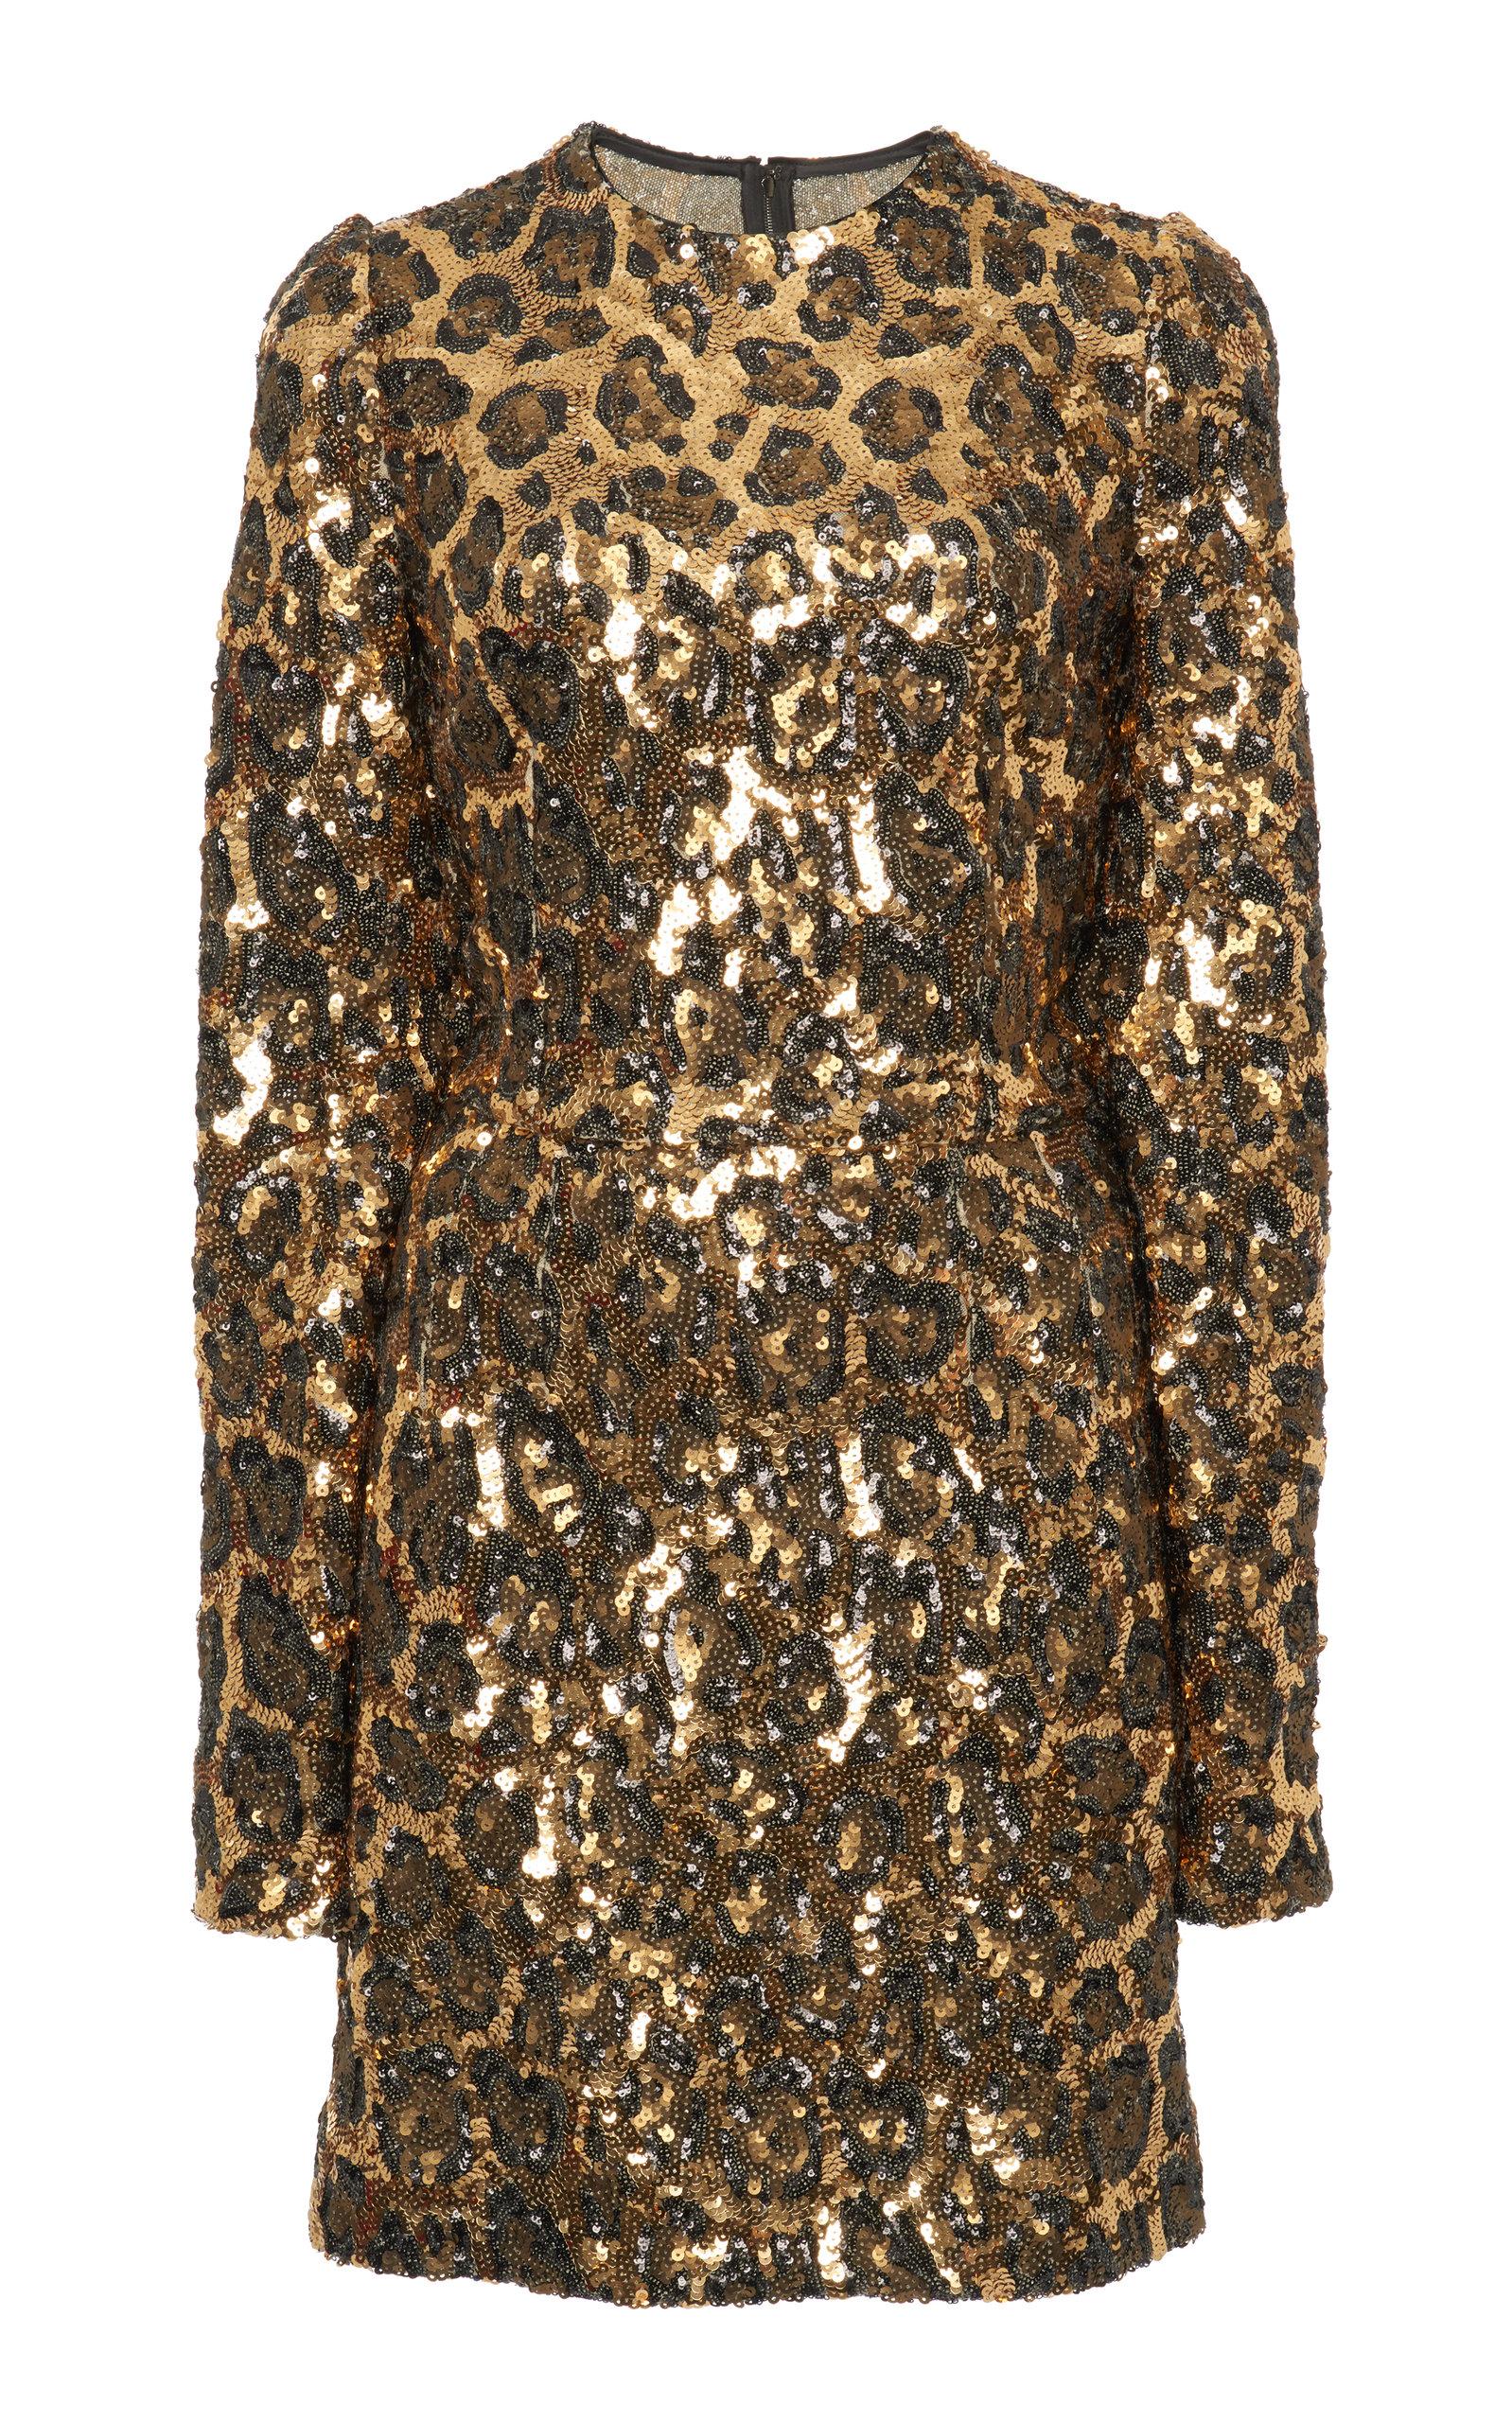 3eaa6a5d43 DOLCE & GABBANA LEOPARD PRINT SEQUIN MINI DRESS, ANIMAL | ModeSens